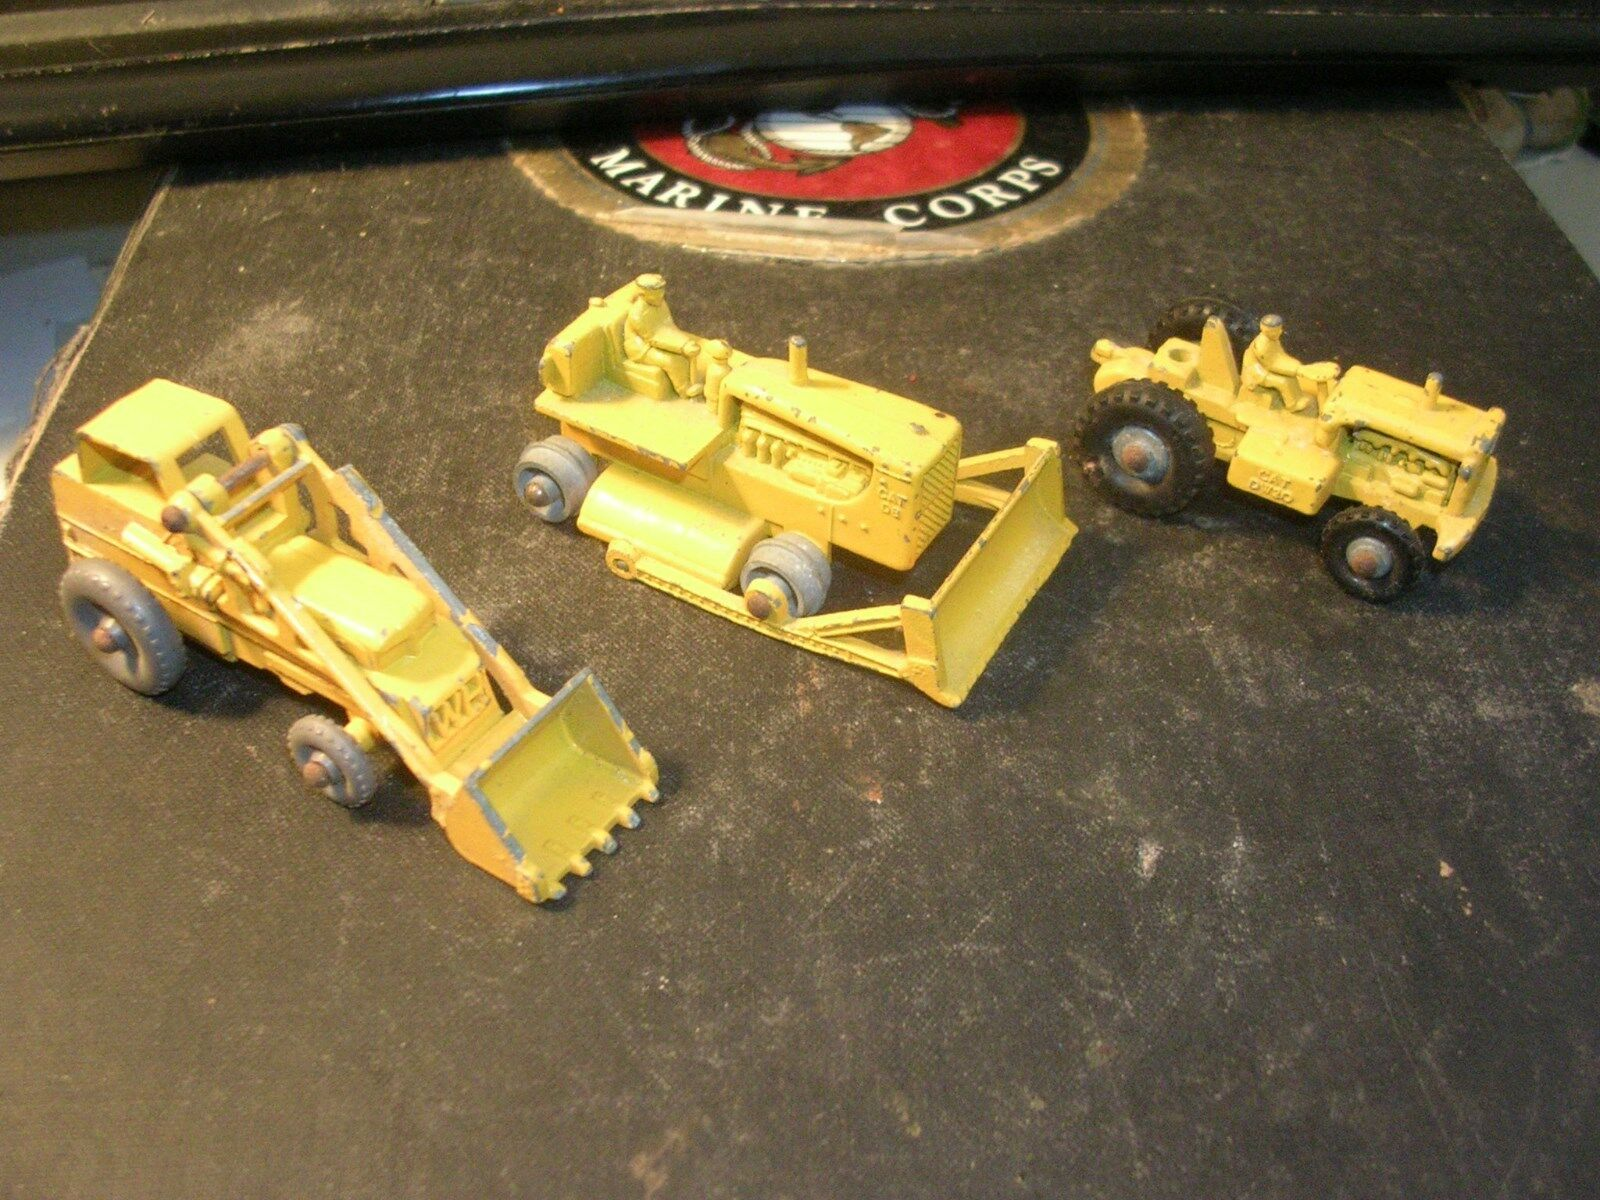 3 1960's Lesney Construction Set  's 1,2,3  Dozer - Tractor - Shovel